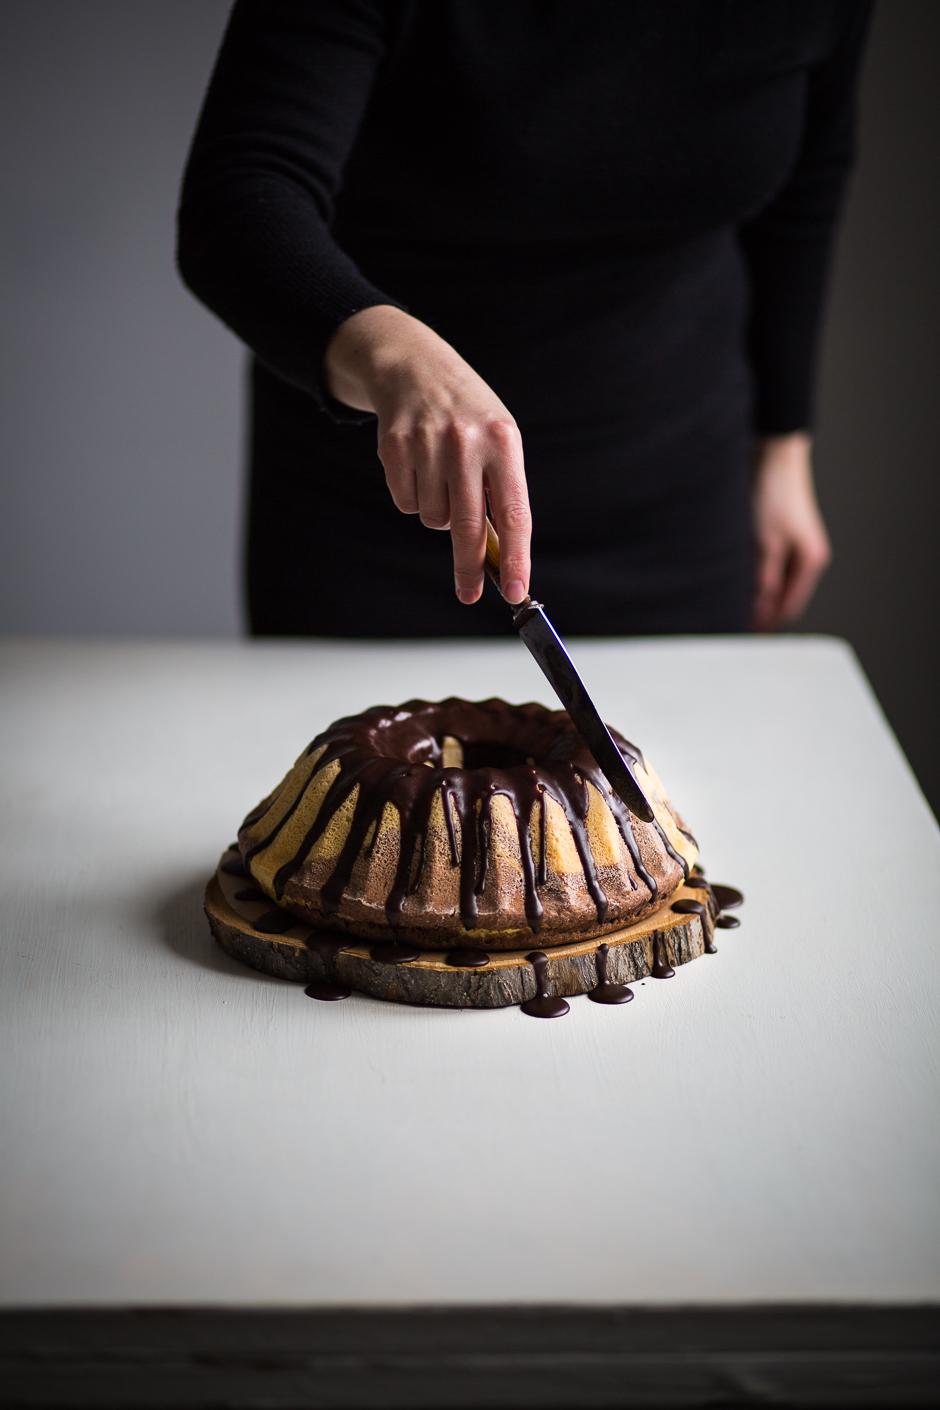 kugelhopf with chocolate glaze from the Taste of Memories Hungarian country kitchen www.tasteofmemories.com